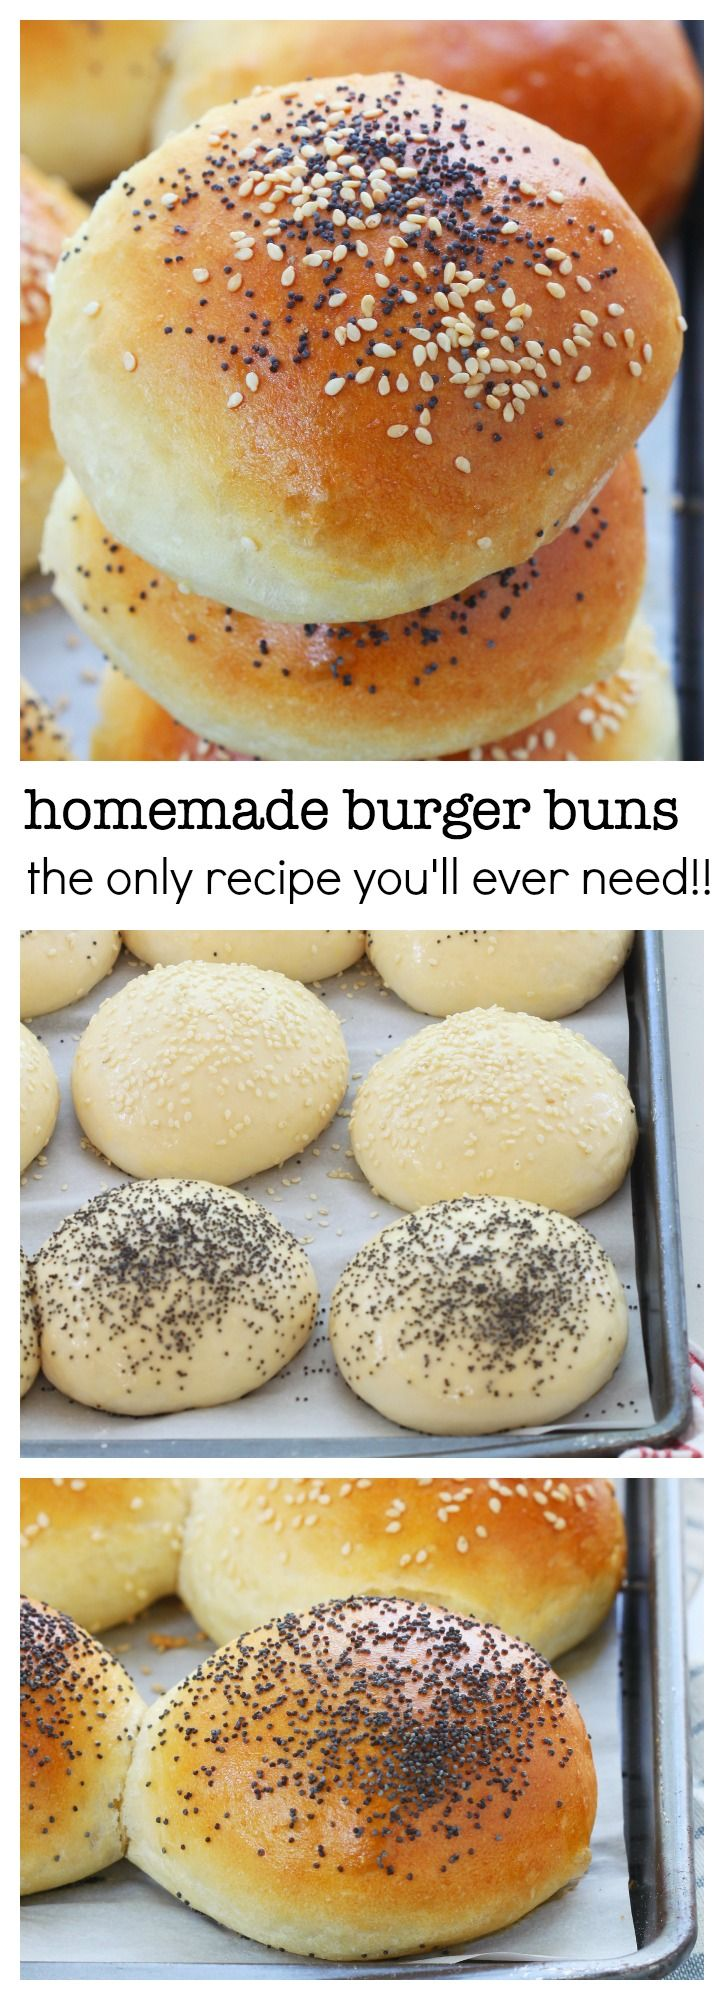 Awe Inspiring 25 Best Ideas About Burger Buns On Pinterest Homemade Burger Short Hairstyles For Black Women Fulllsitofus